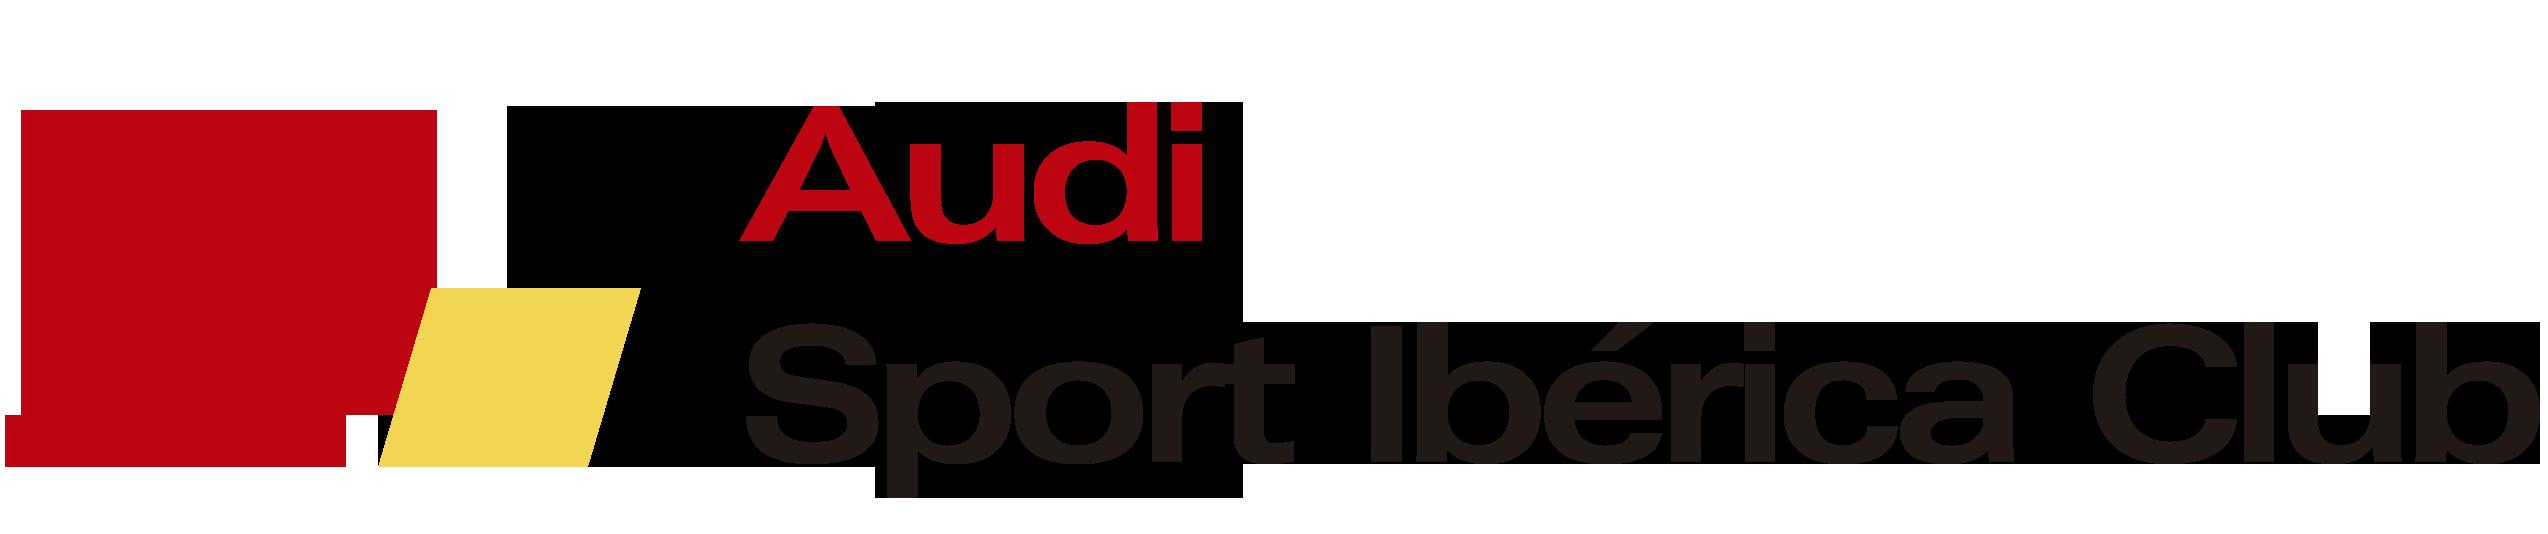 Audisport Iberica